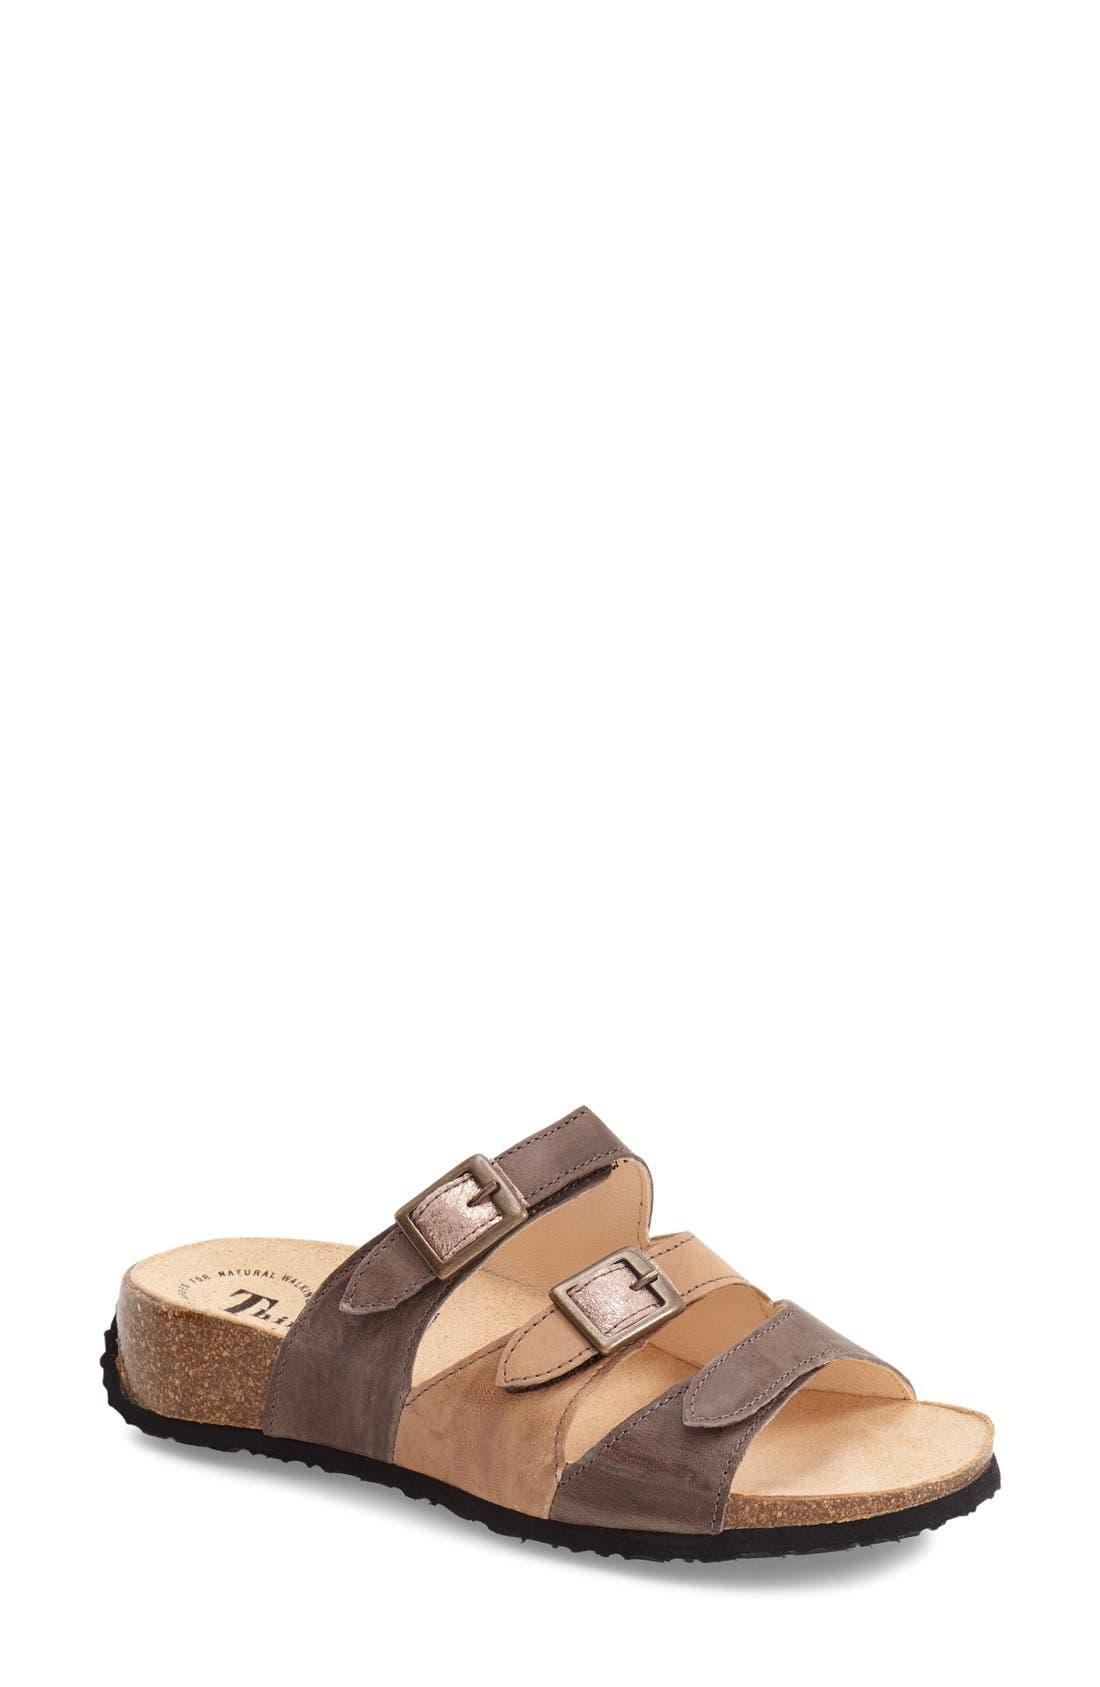 'Mizzi' Sandal,                             Main thumbnail 1, color,                             Cappucino Leather